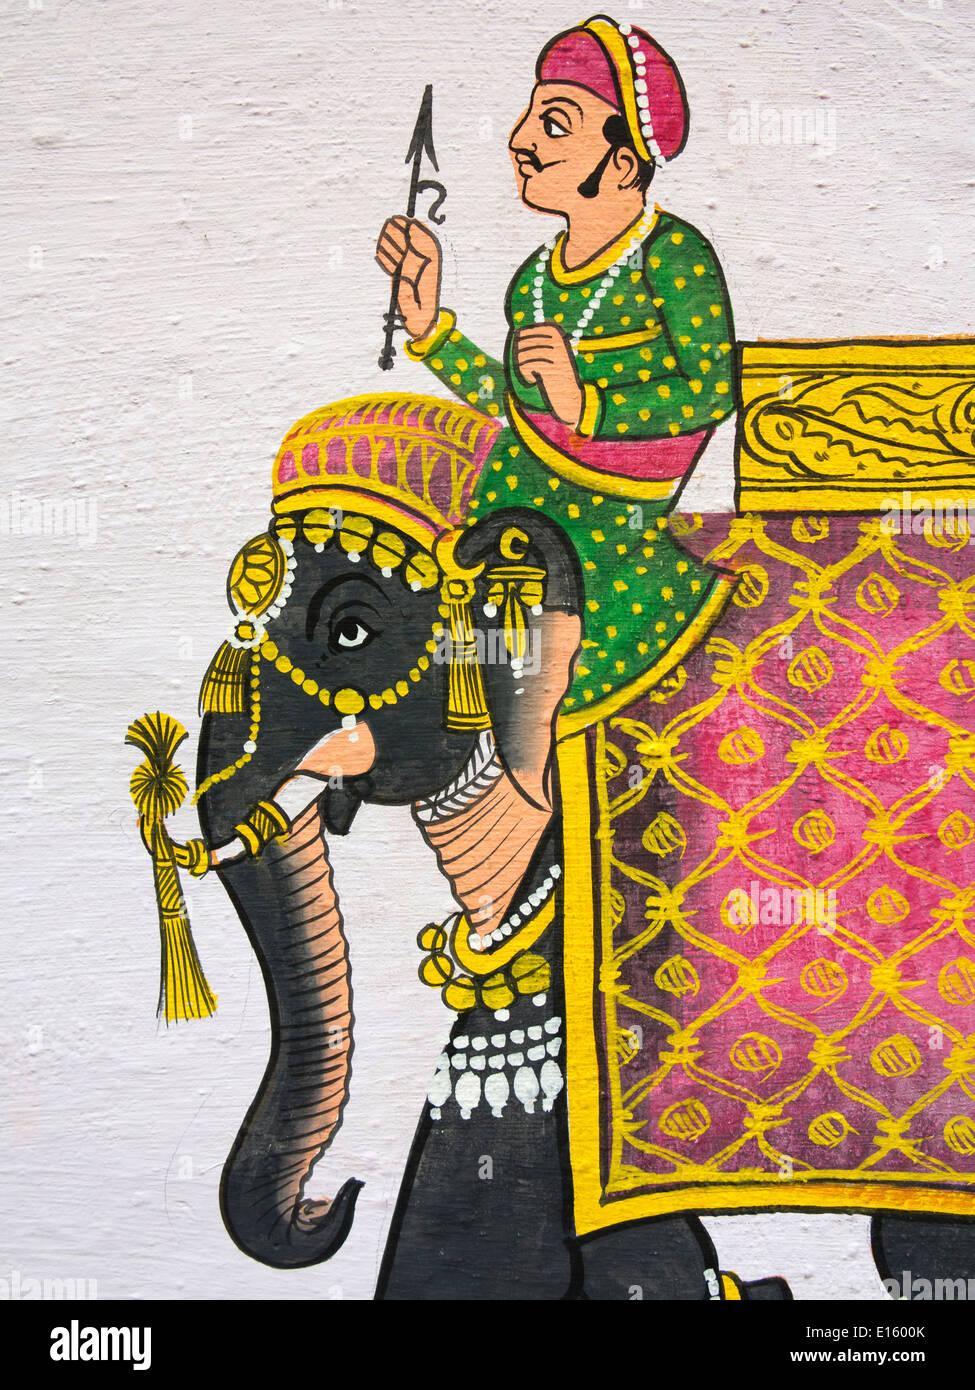 India Rajasthan, Udaipur, tradizionale pittura murale di Rajput uomo su elefante Immagini Stock